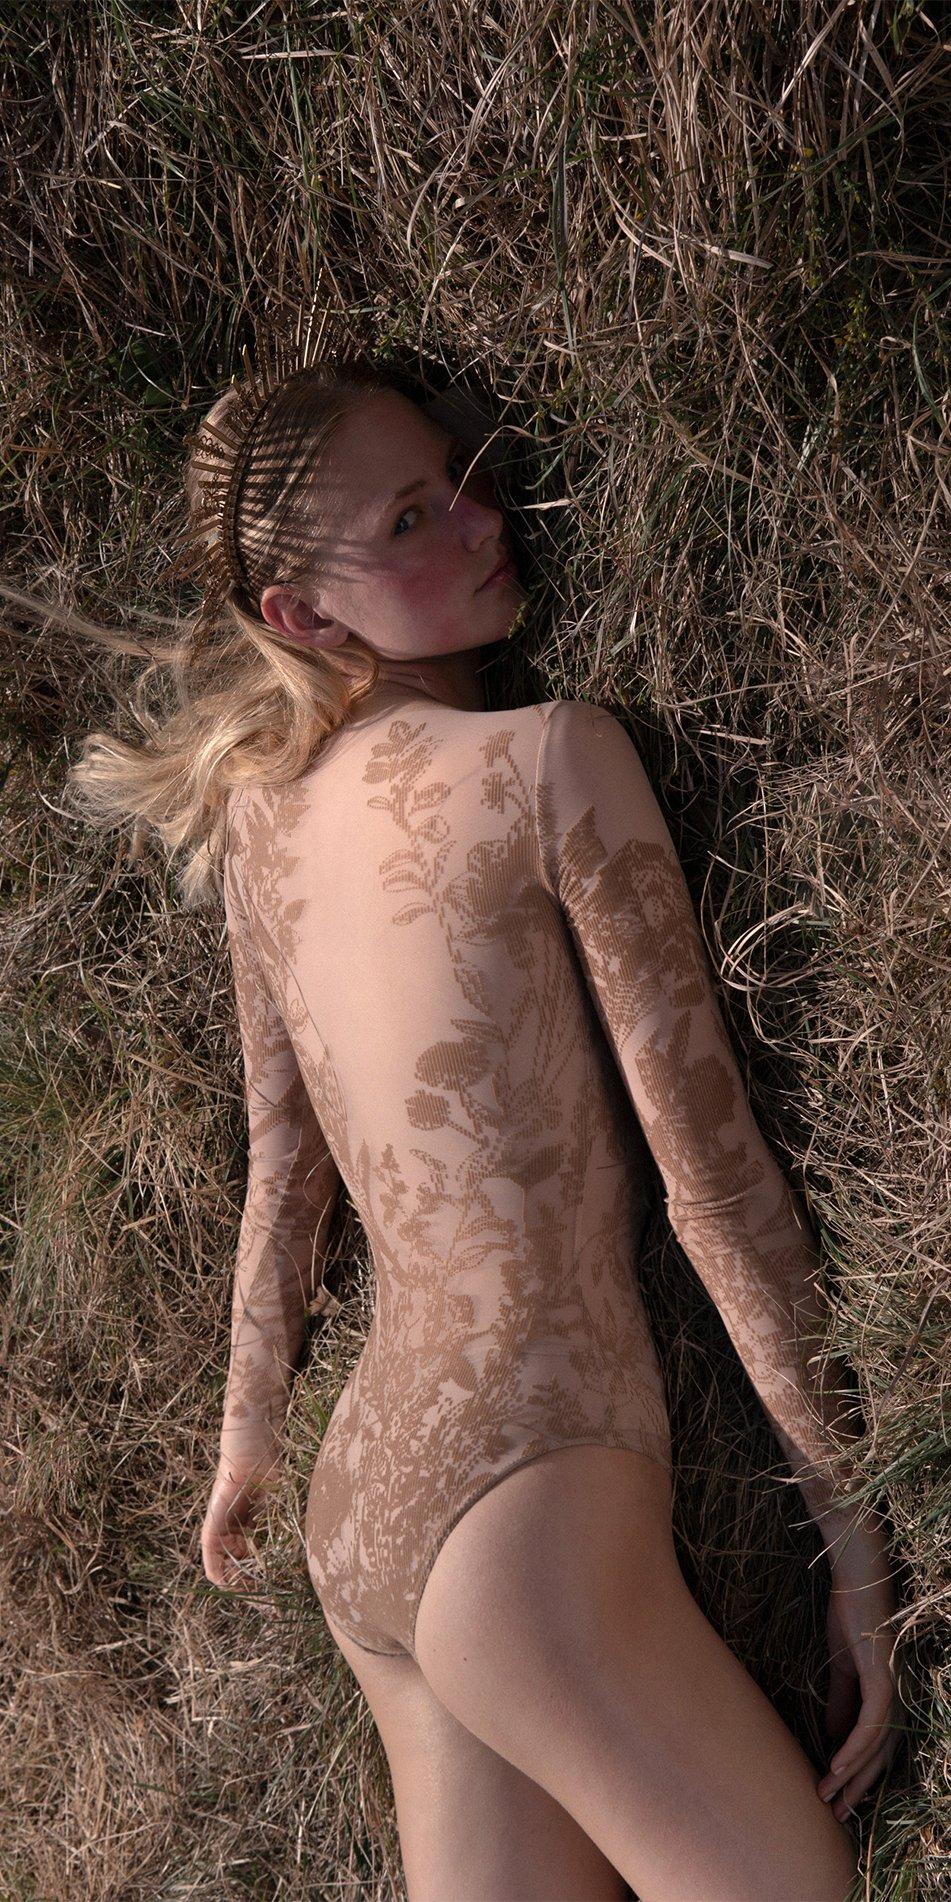 BLOSSOMS nude second skin flock print bodysuit 9